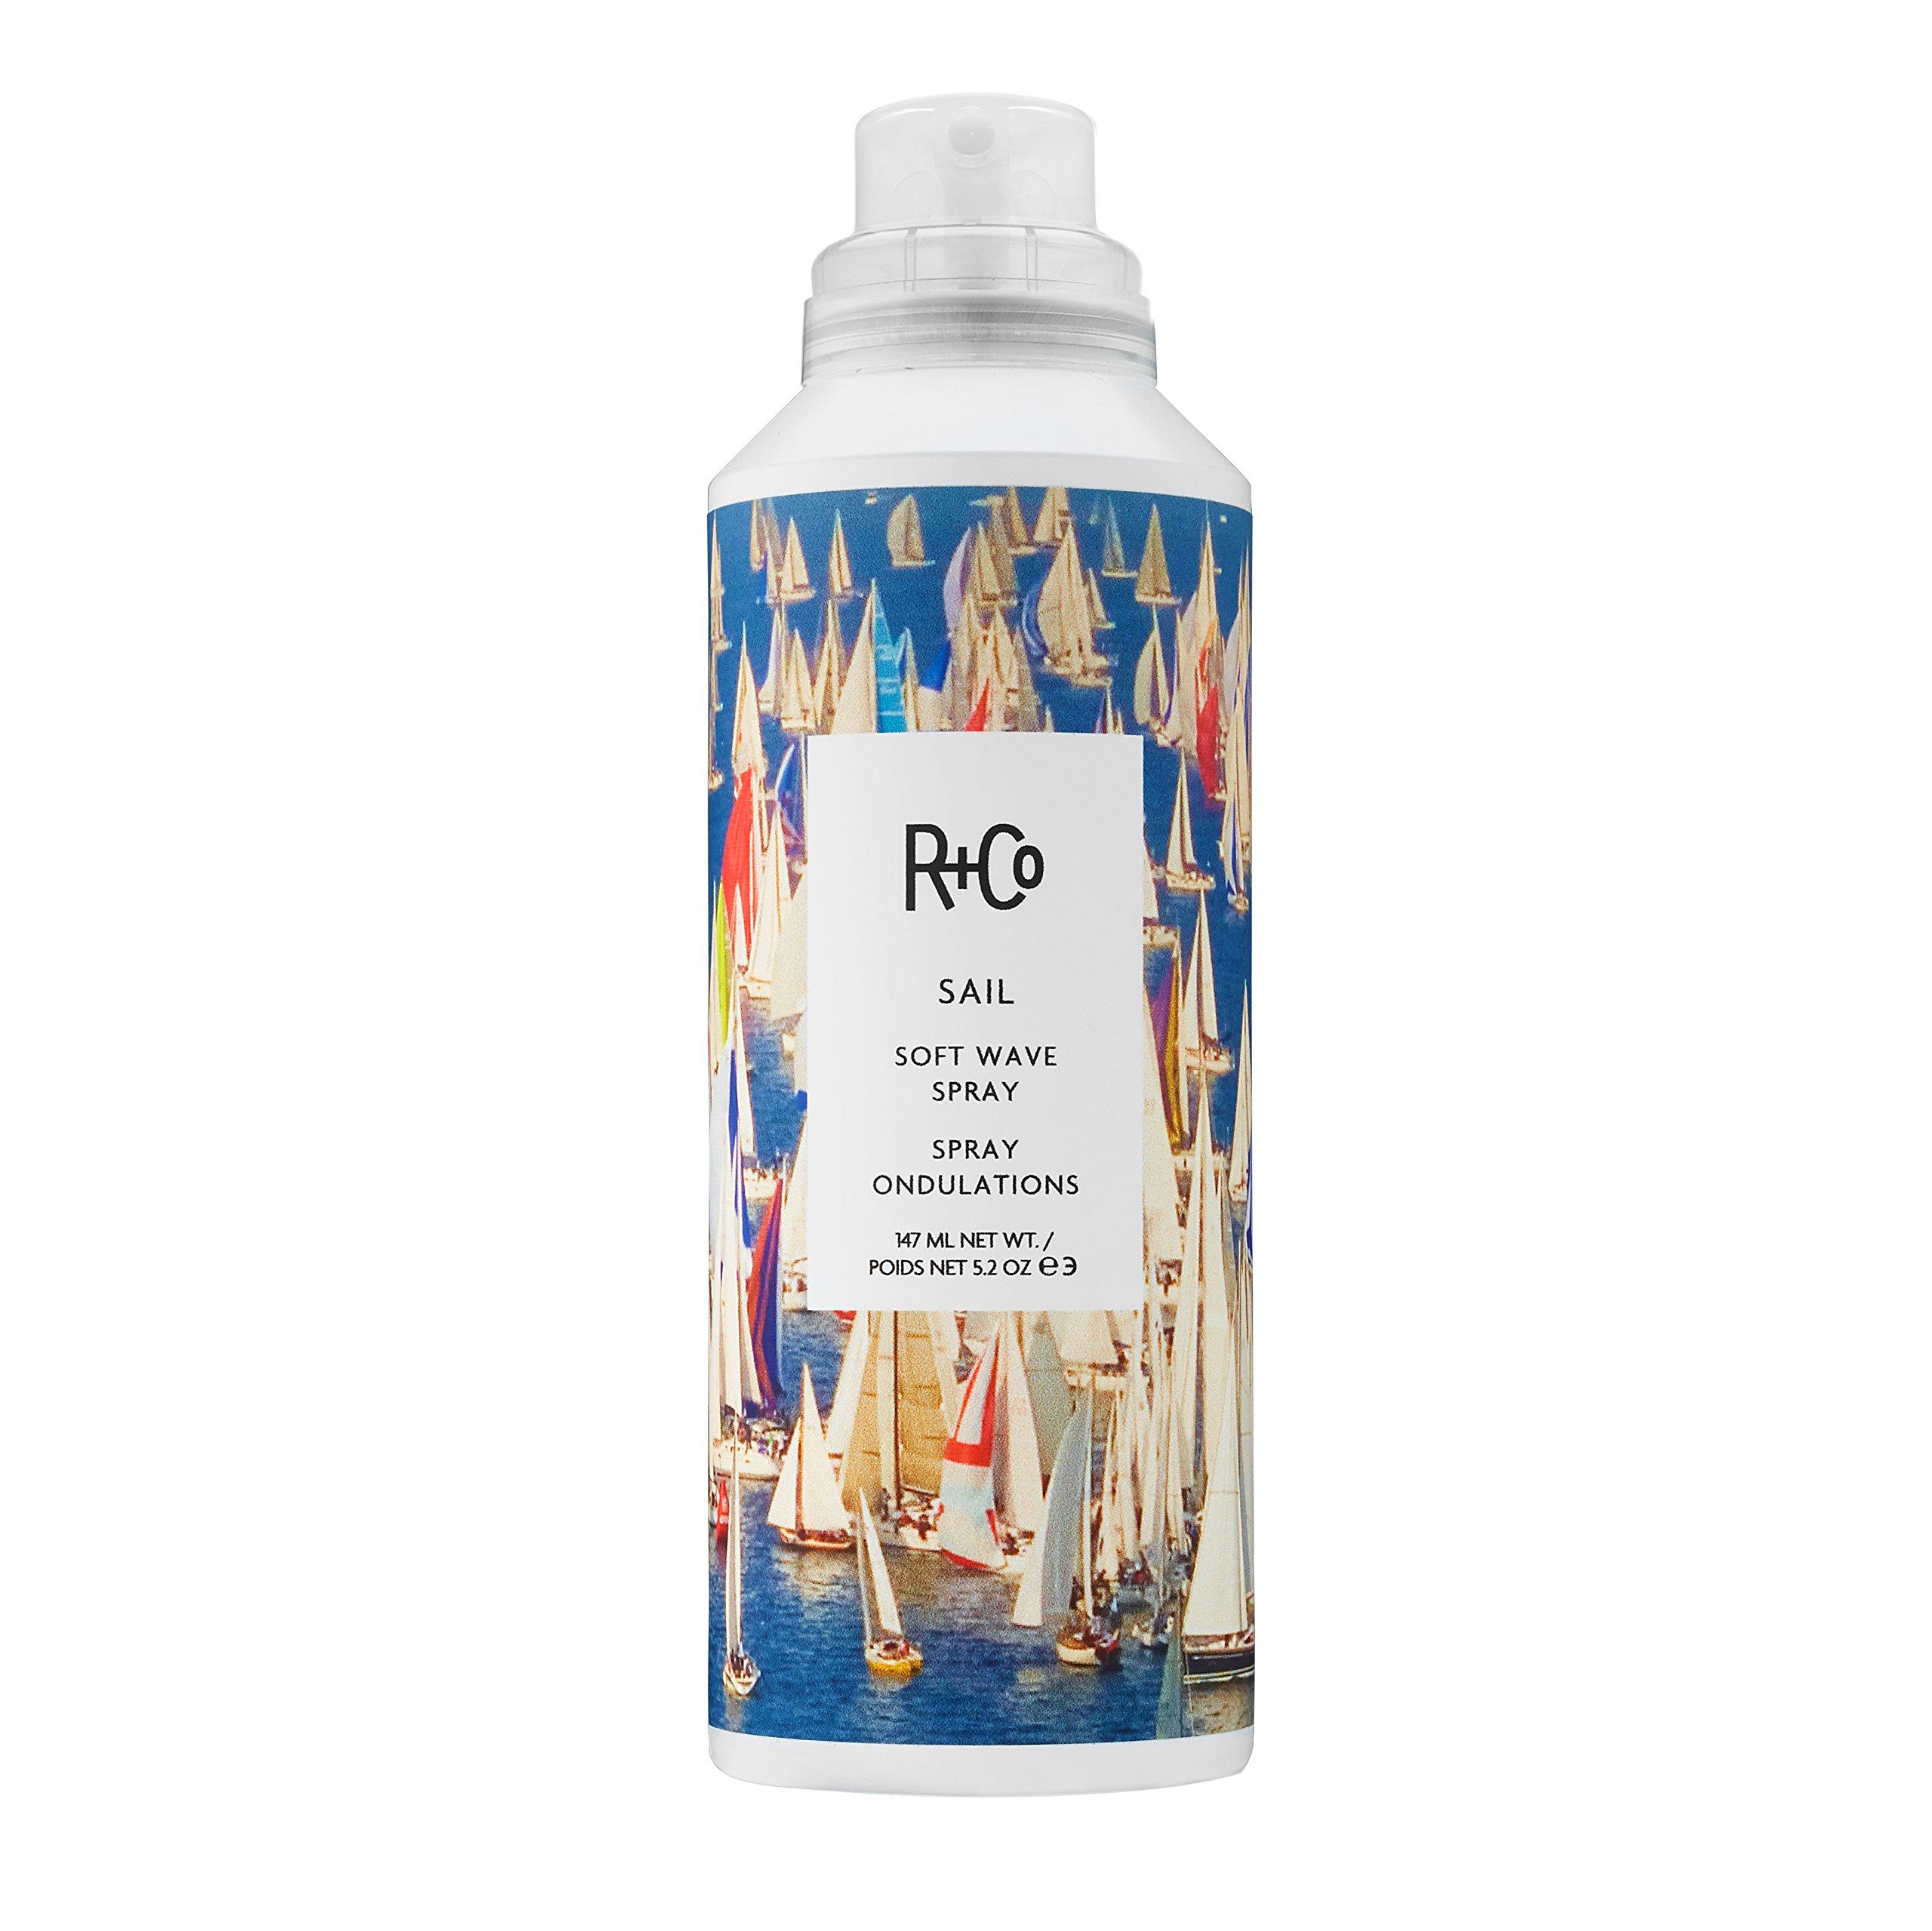 R+Co Sail Soft Wave Spray, 5.2 oz by R+Co